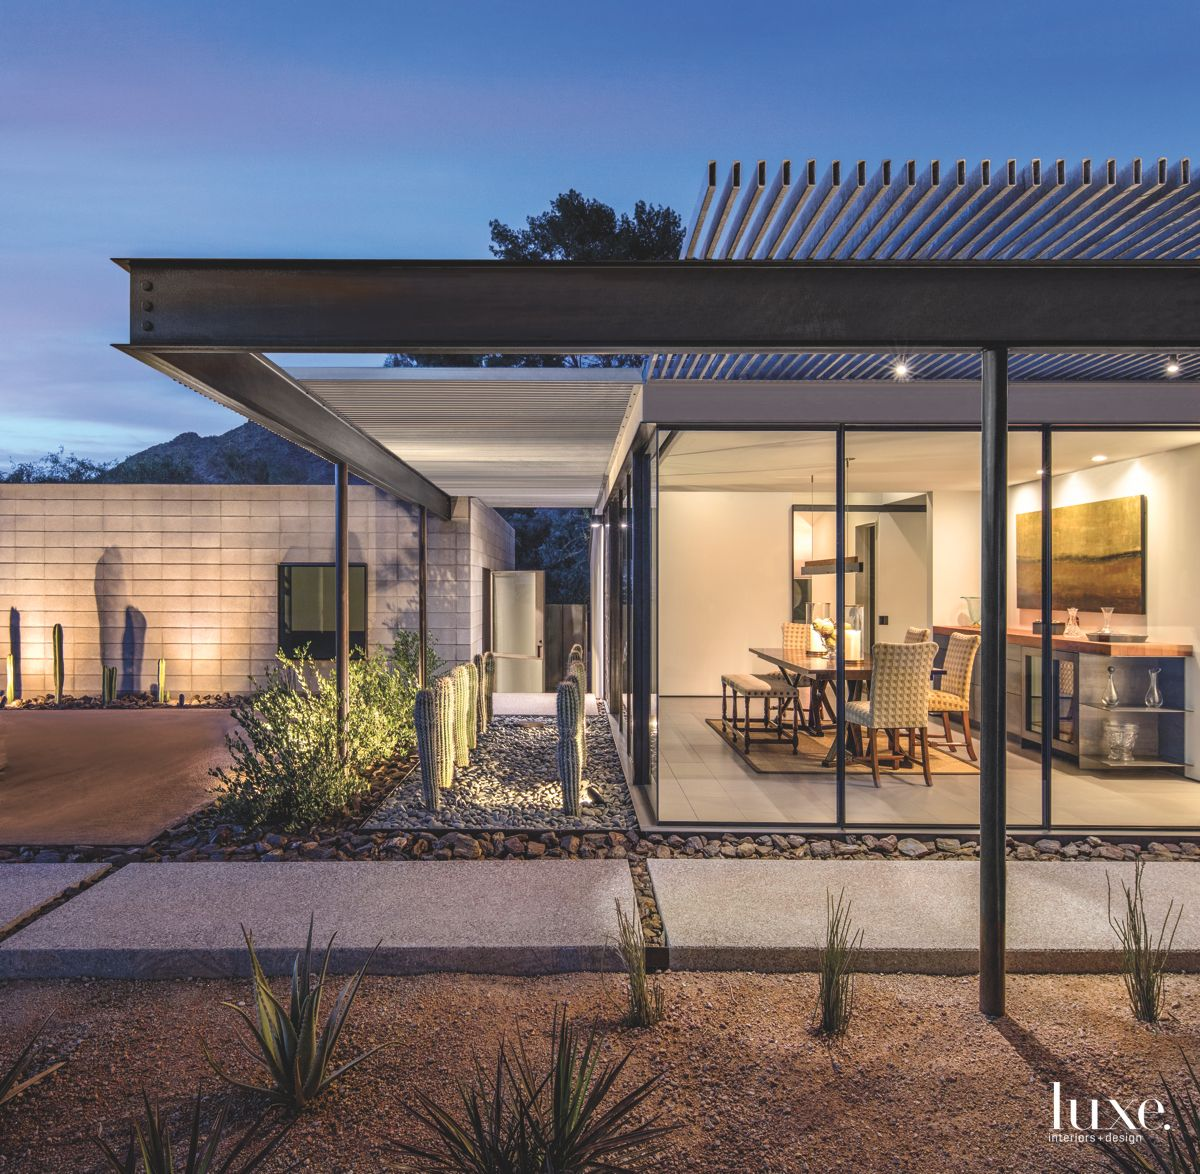 Exterior Steel Trellis Wraparound with Concrete Walkway Underneath and Cacti Rows